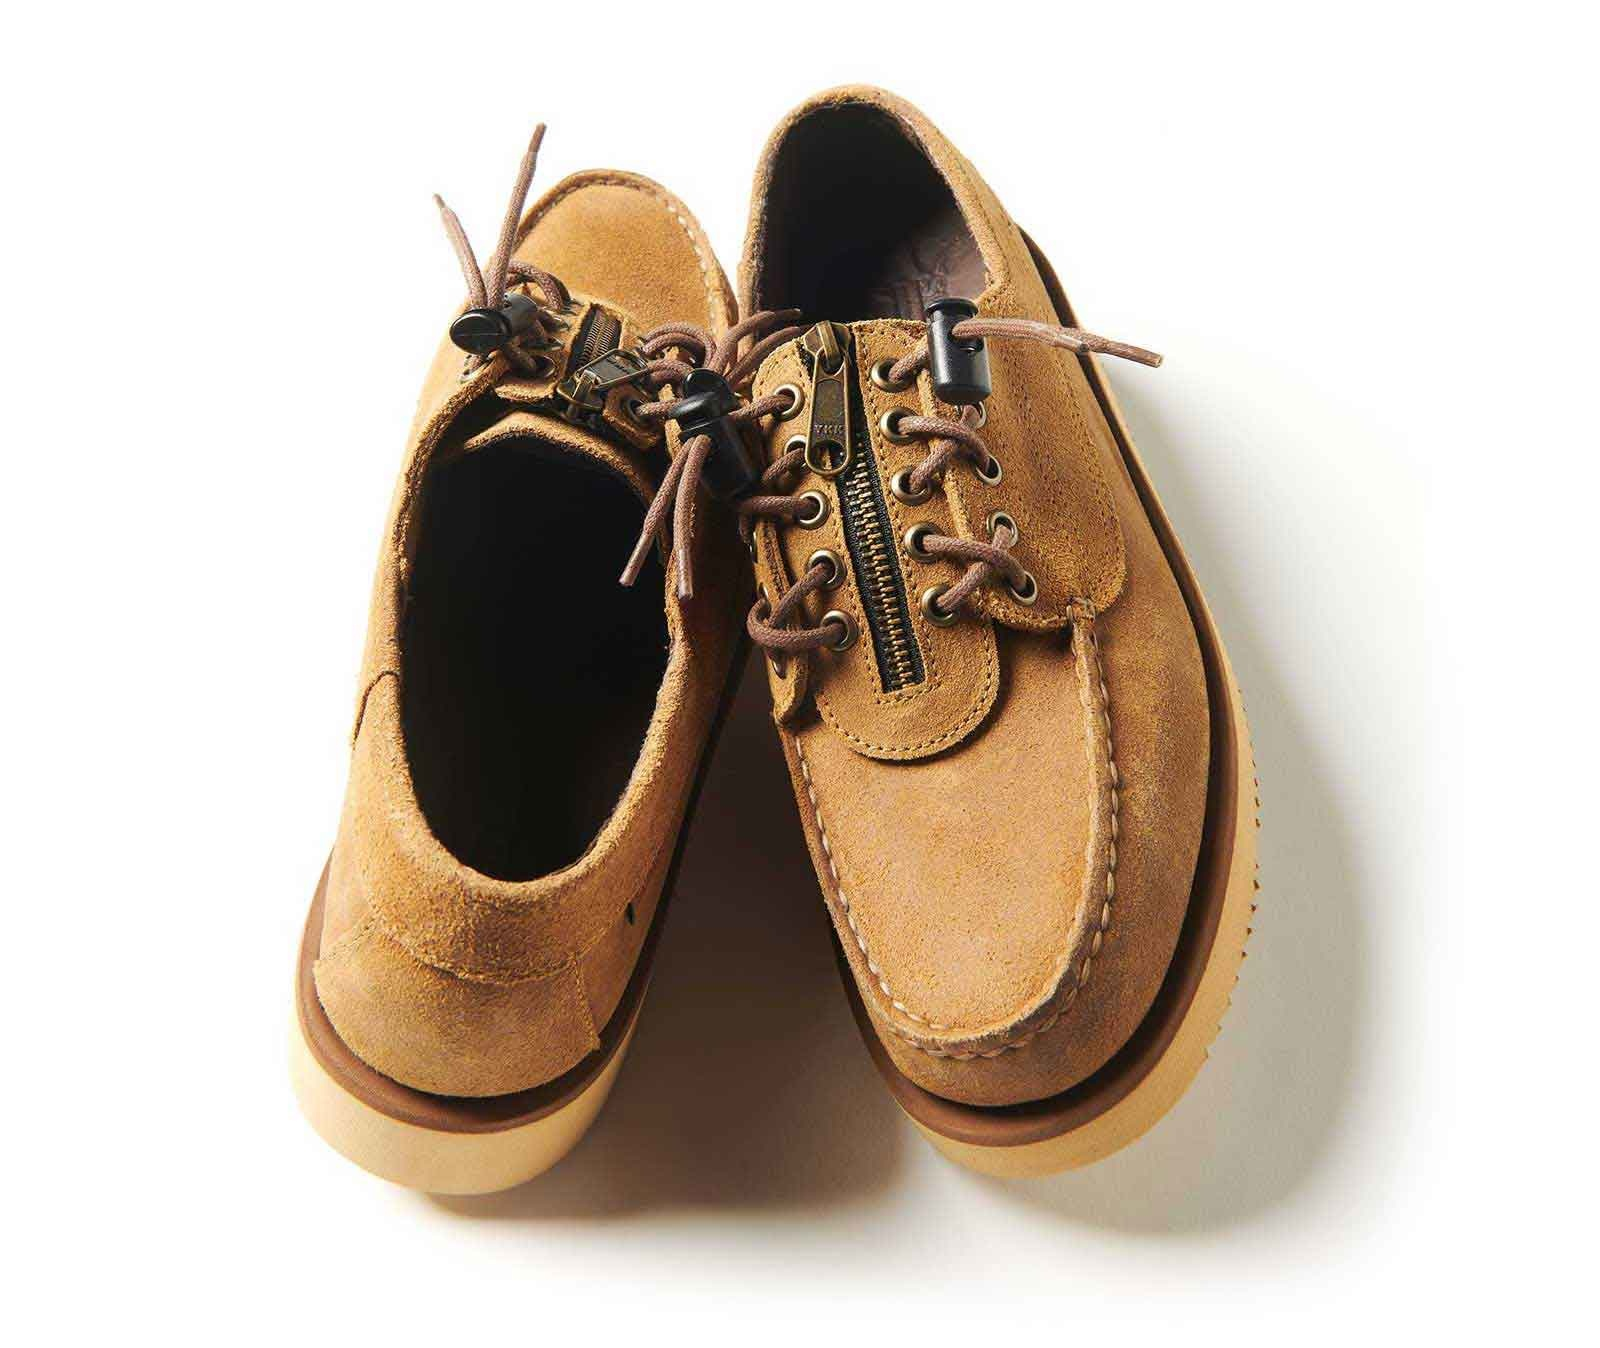 Sebago x Engineered garments deck shoes